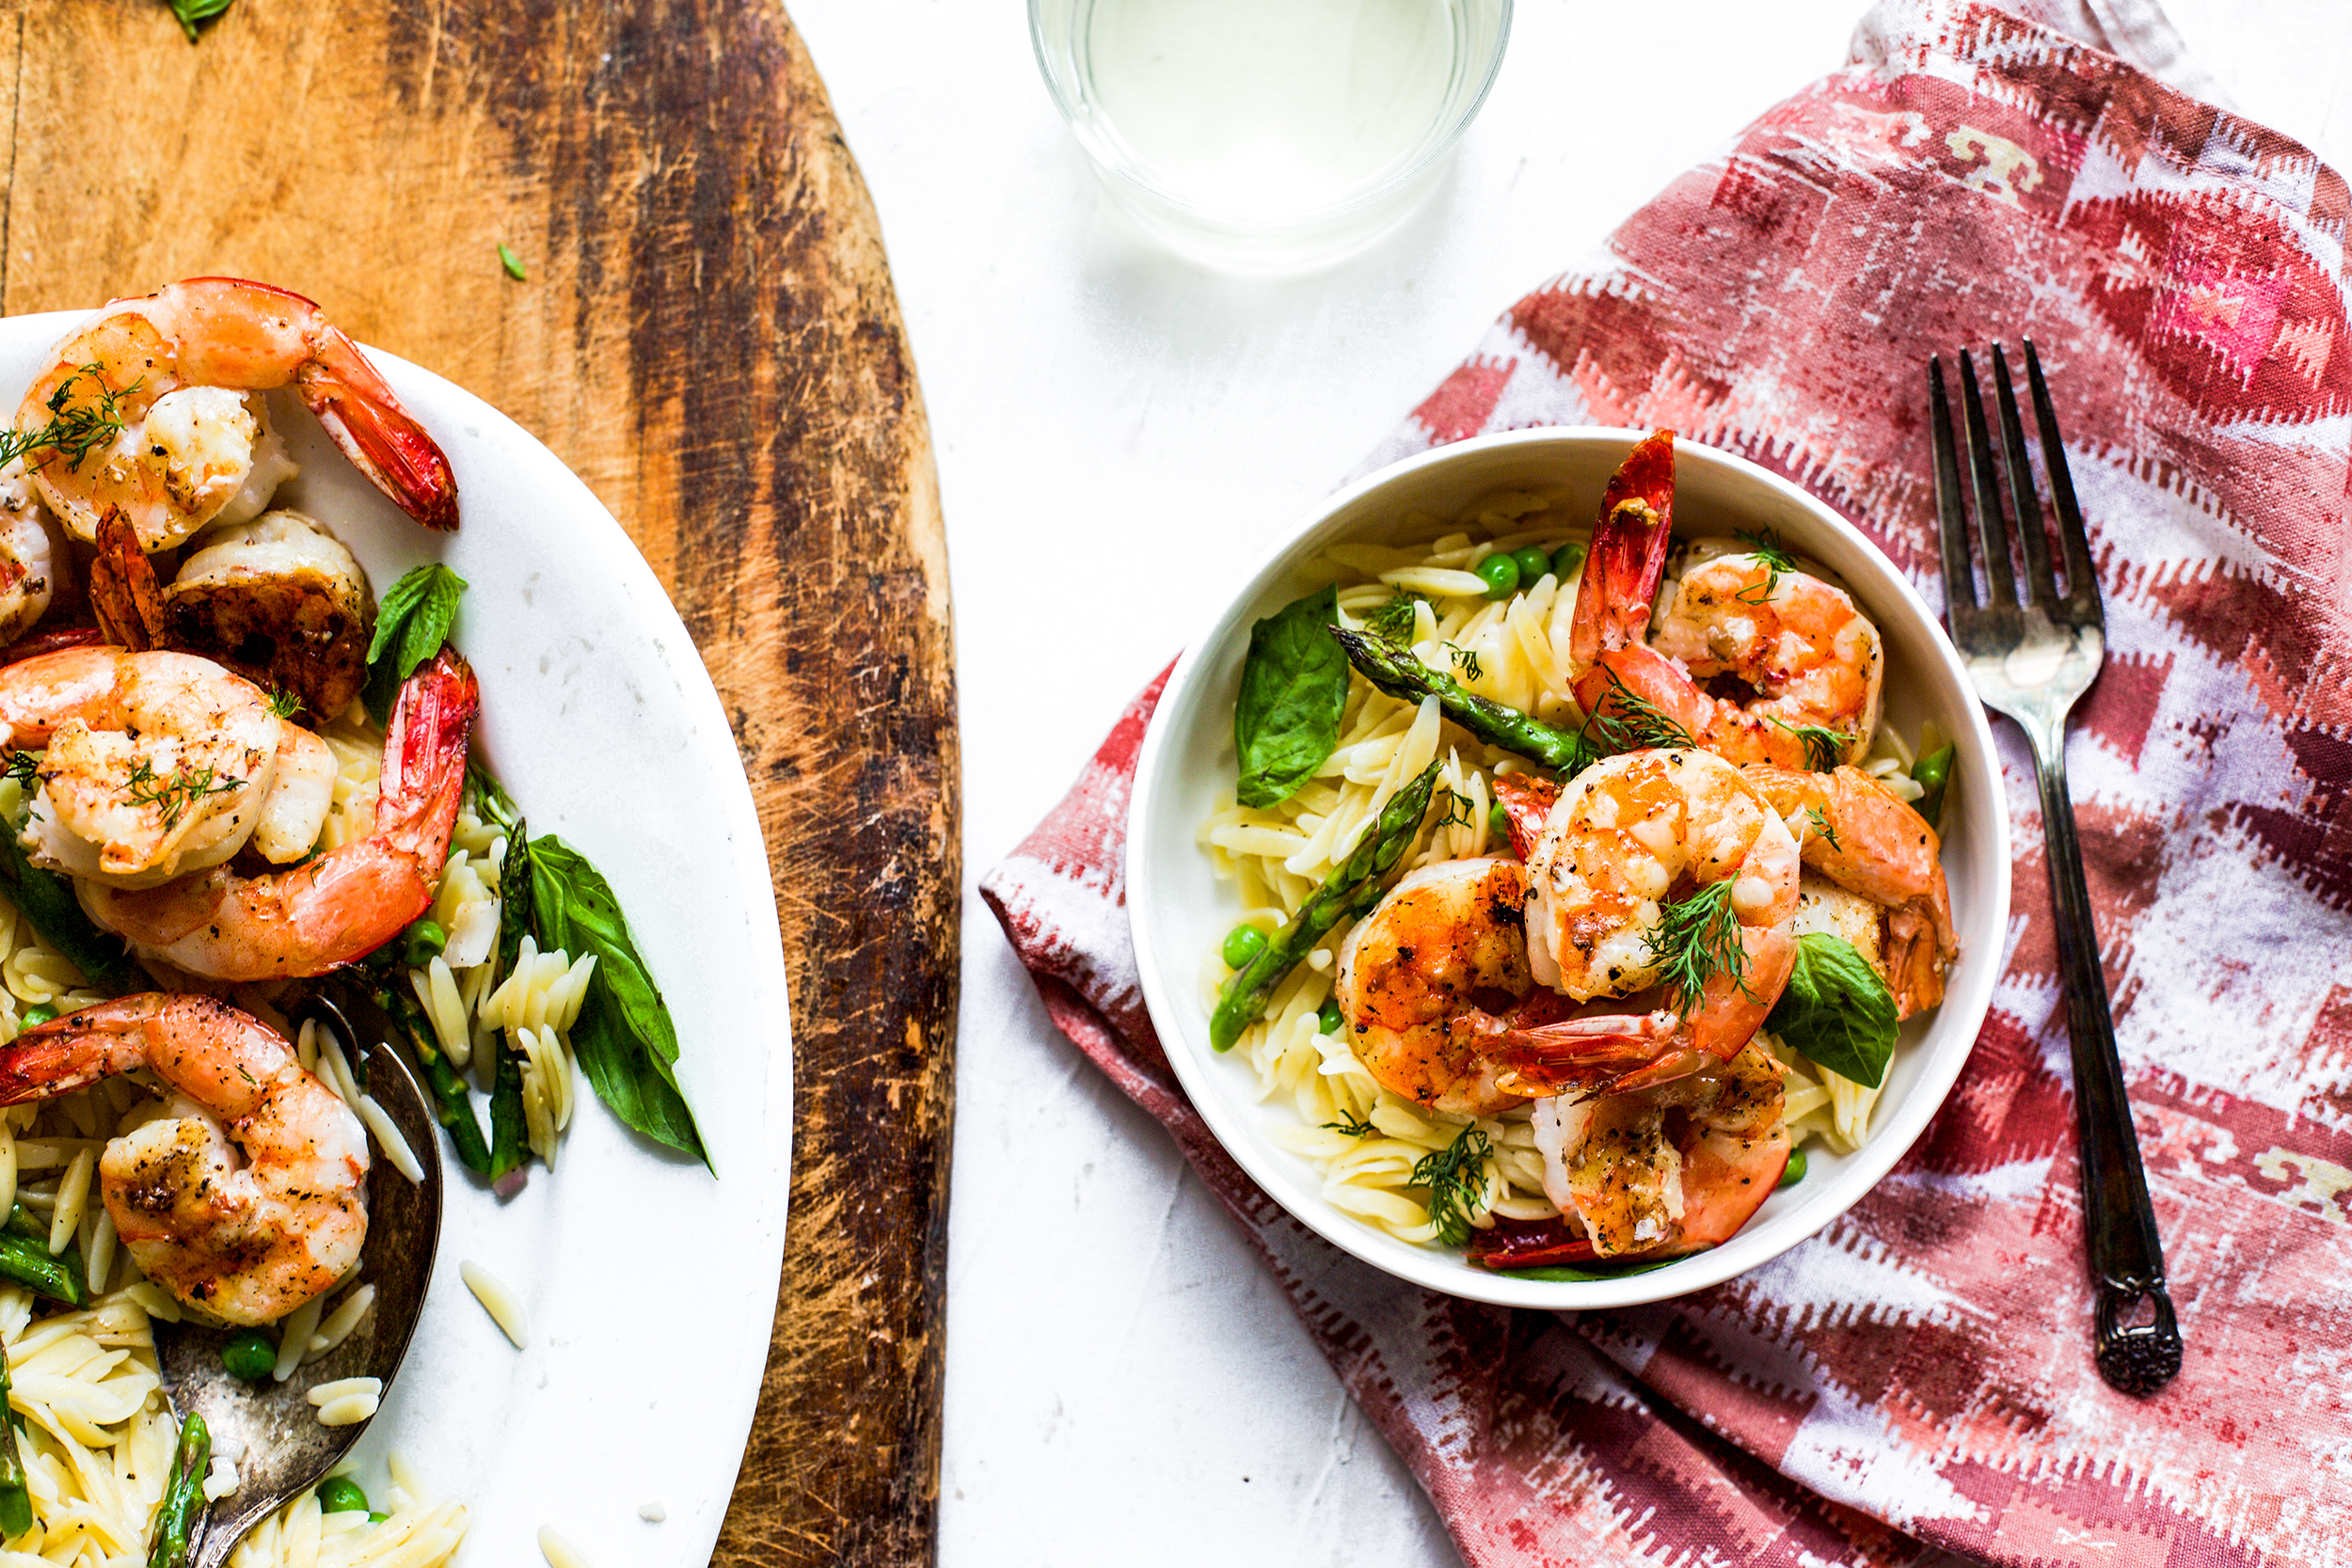 Grilled Lemon, Shrimp, and Asparagus Orzo Salad